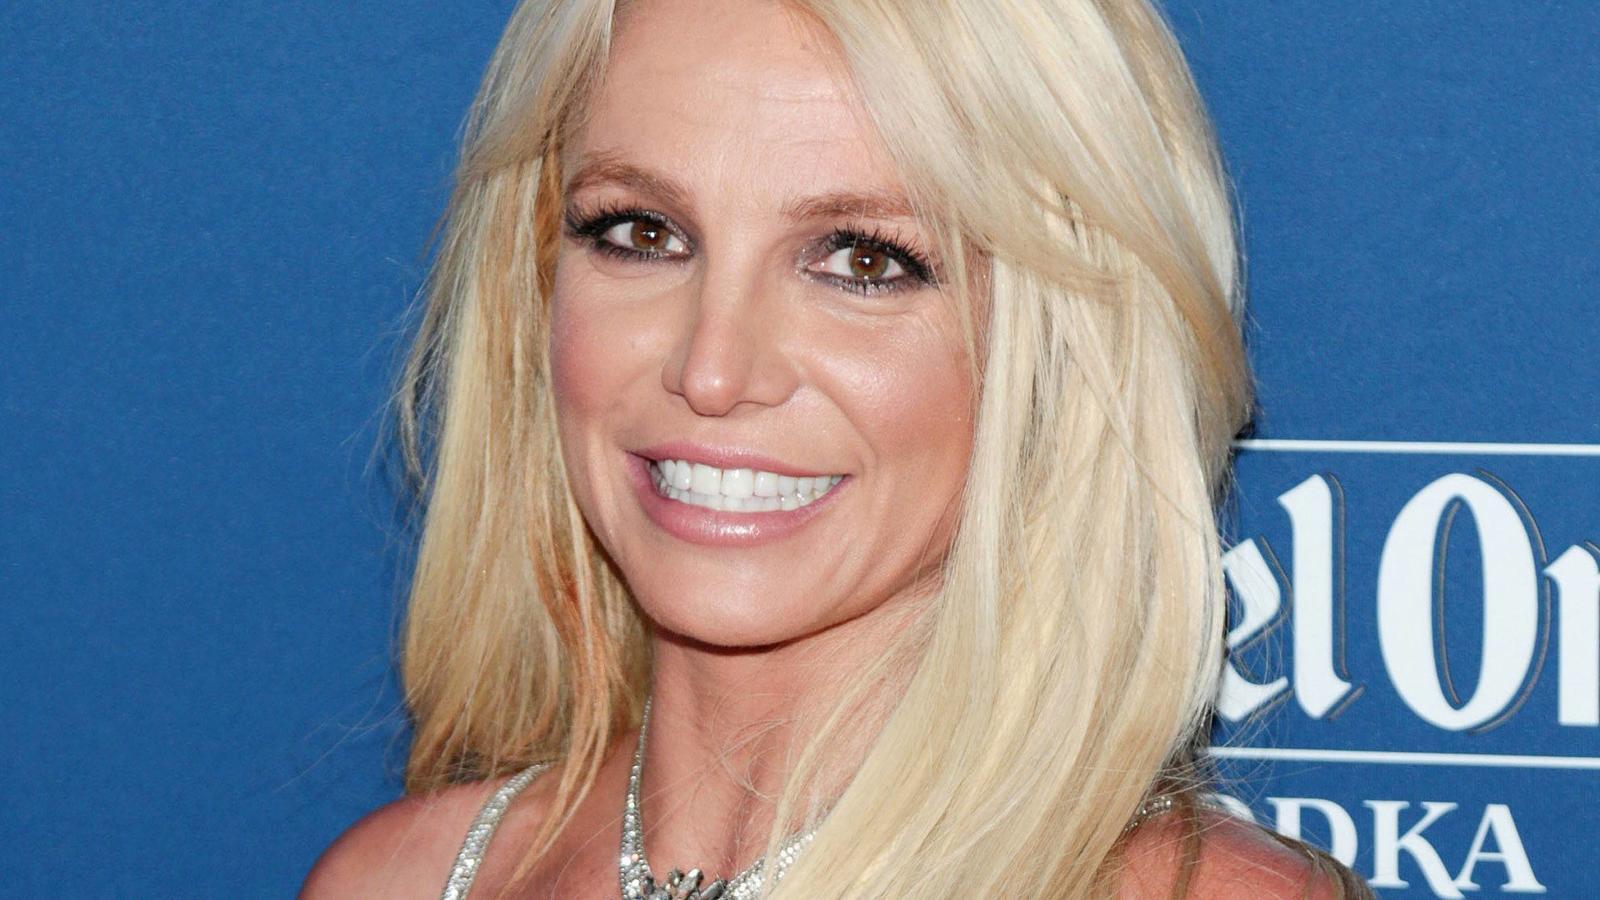 Britney Spears bei der Verleihung der GLAAD Media Awards 2018 in Los Angeles.